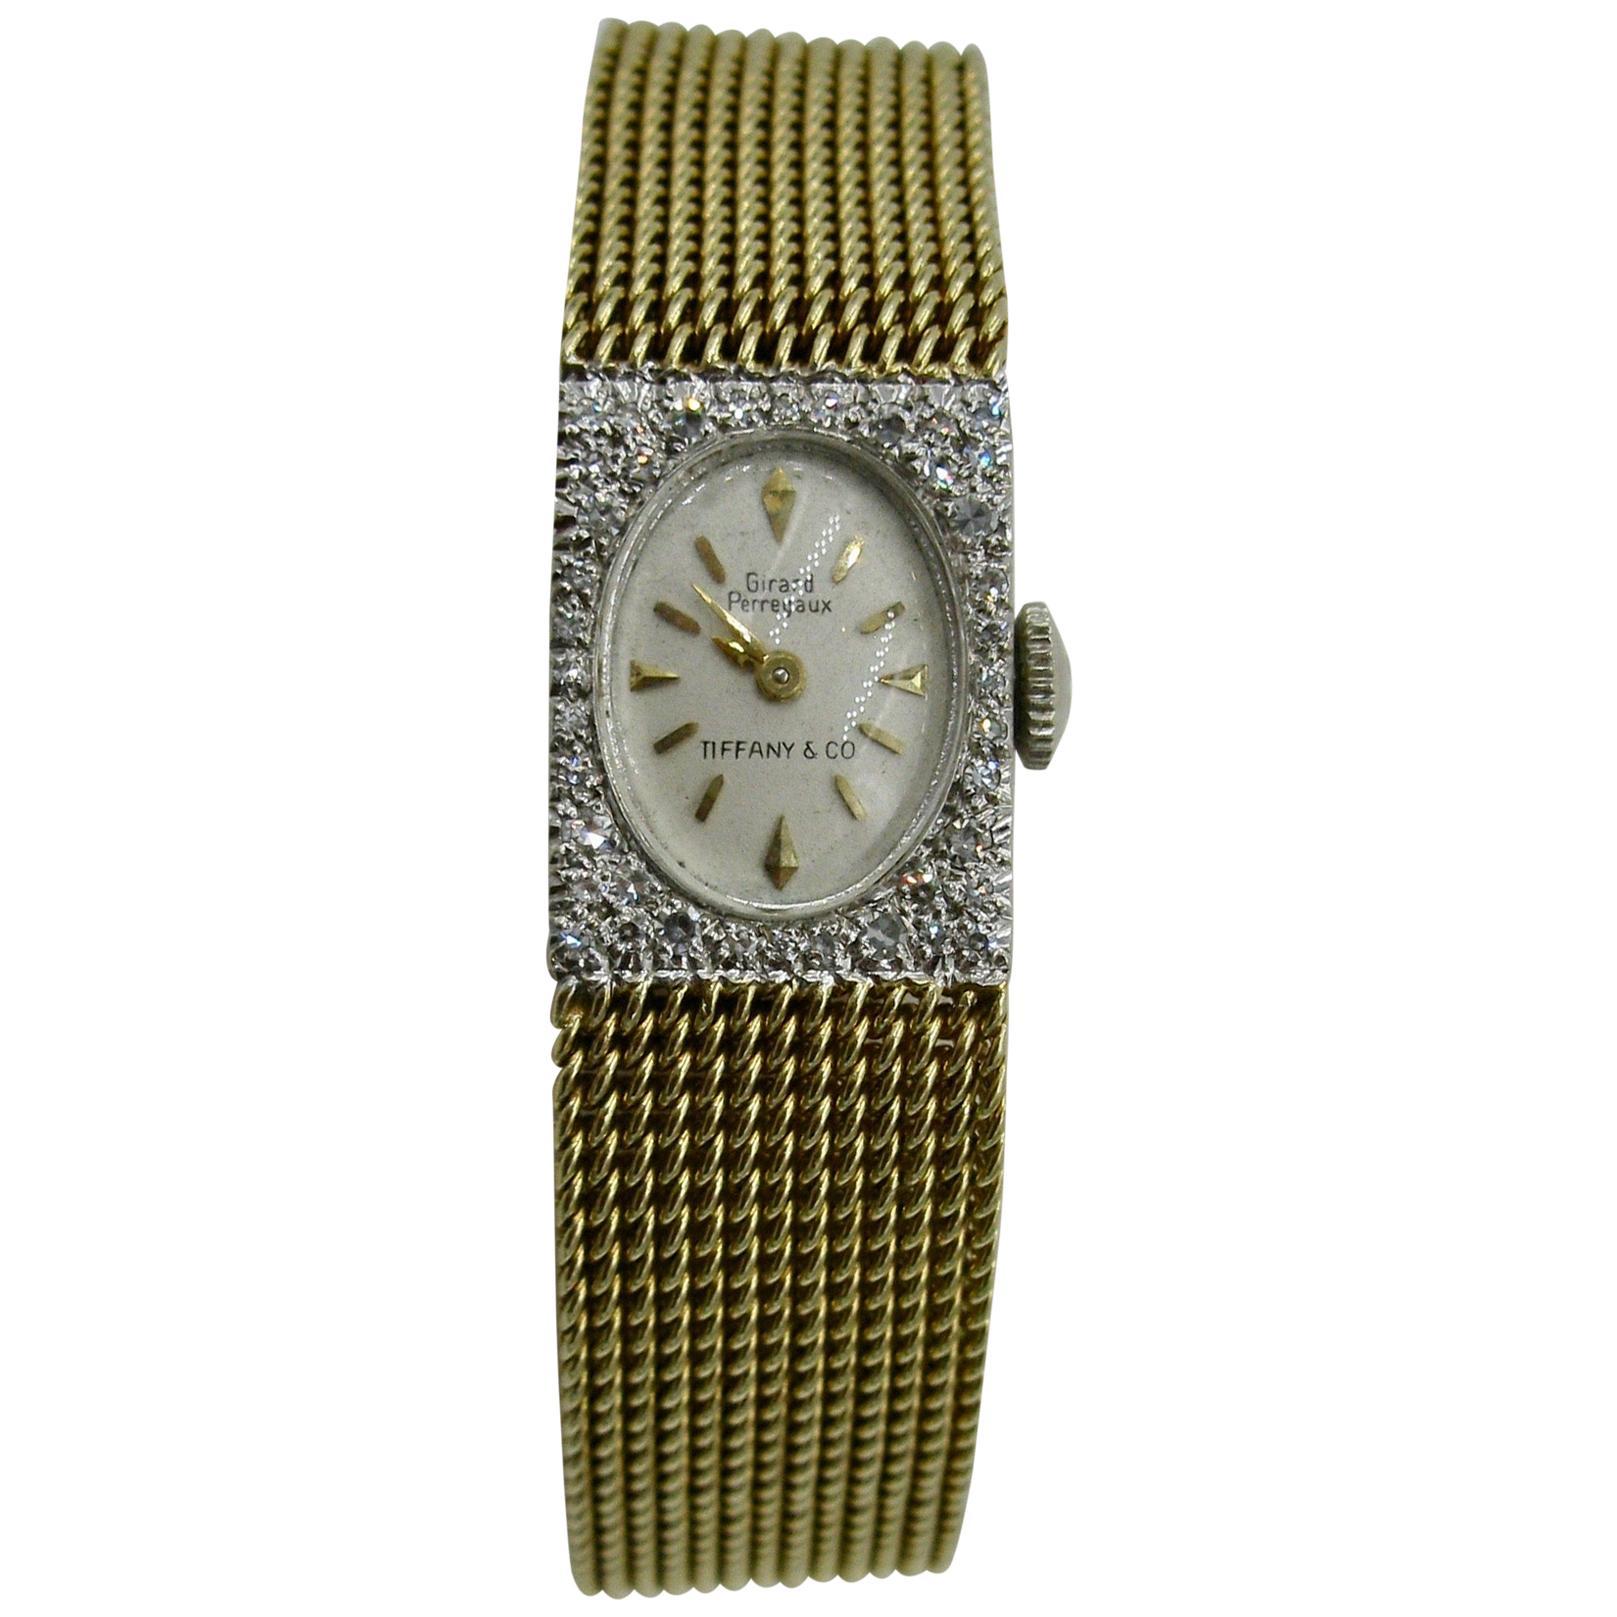 Tiffany & Co. Girard Perregaux Ladies Diamond Wristwatch Retro Midcentury 14K